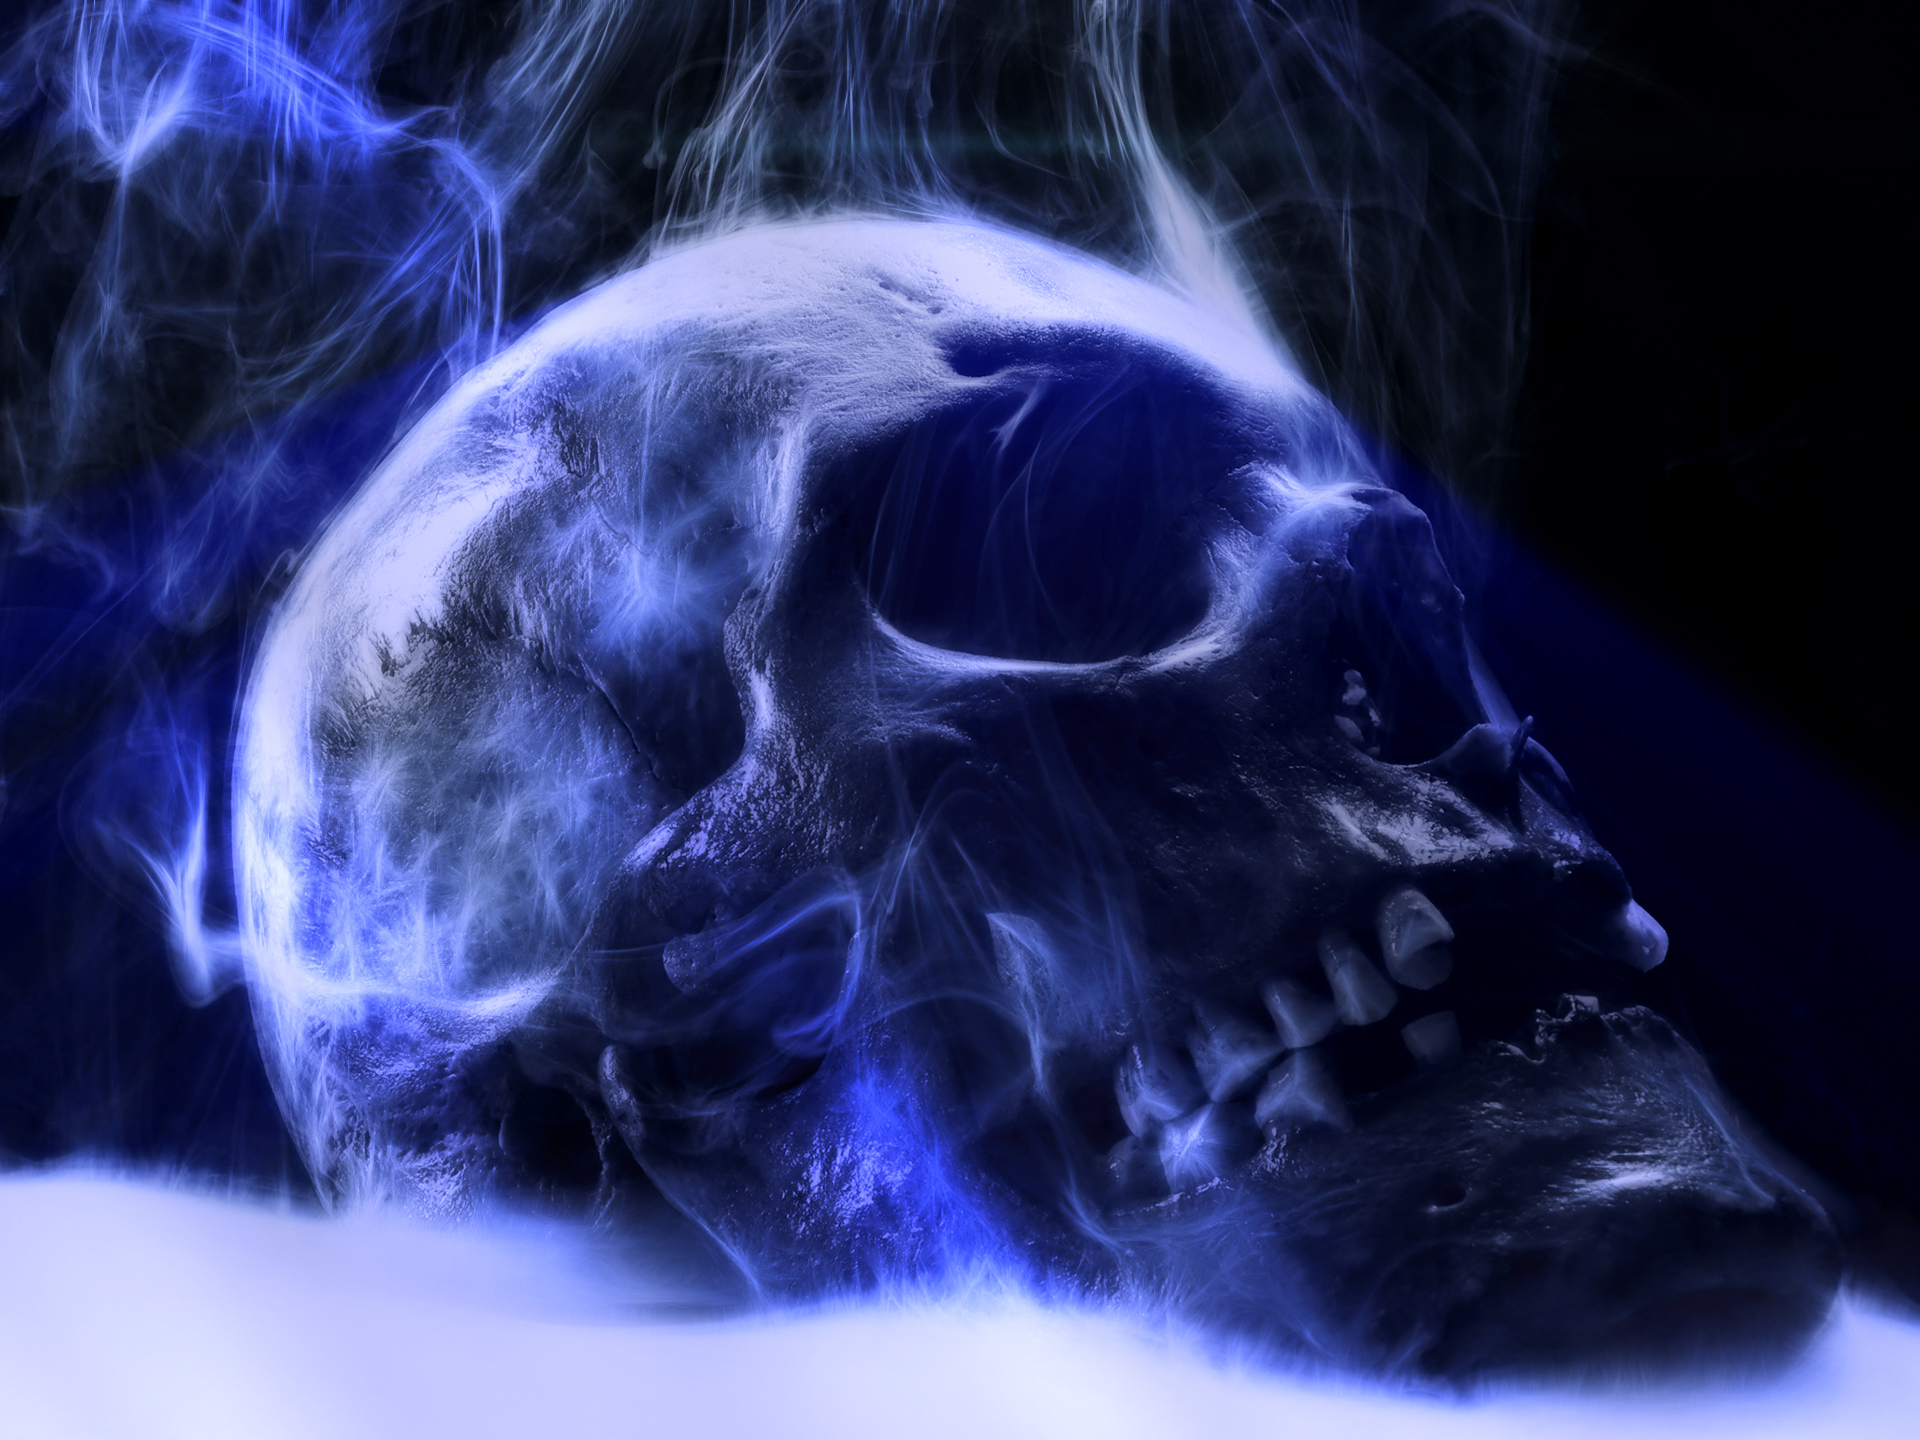 Smoking Skull Wallpapers - WallpaperSafari